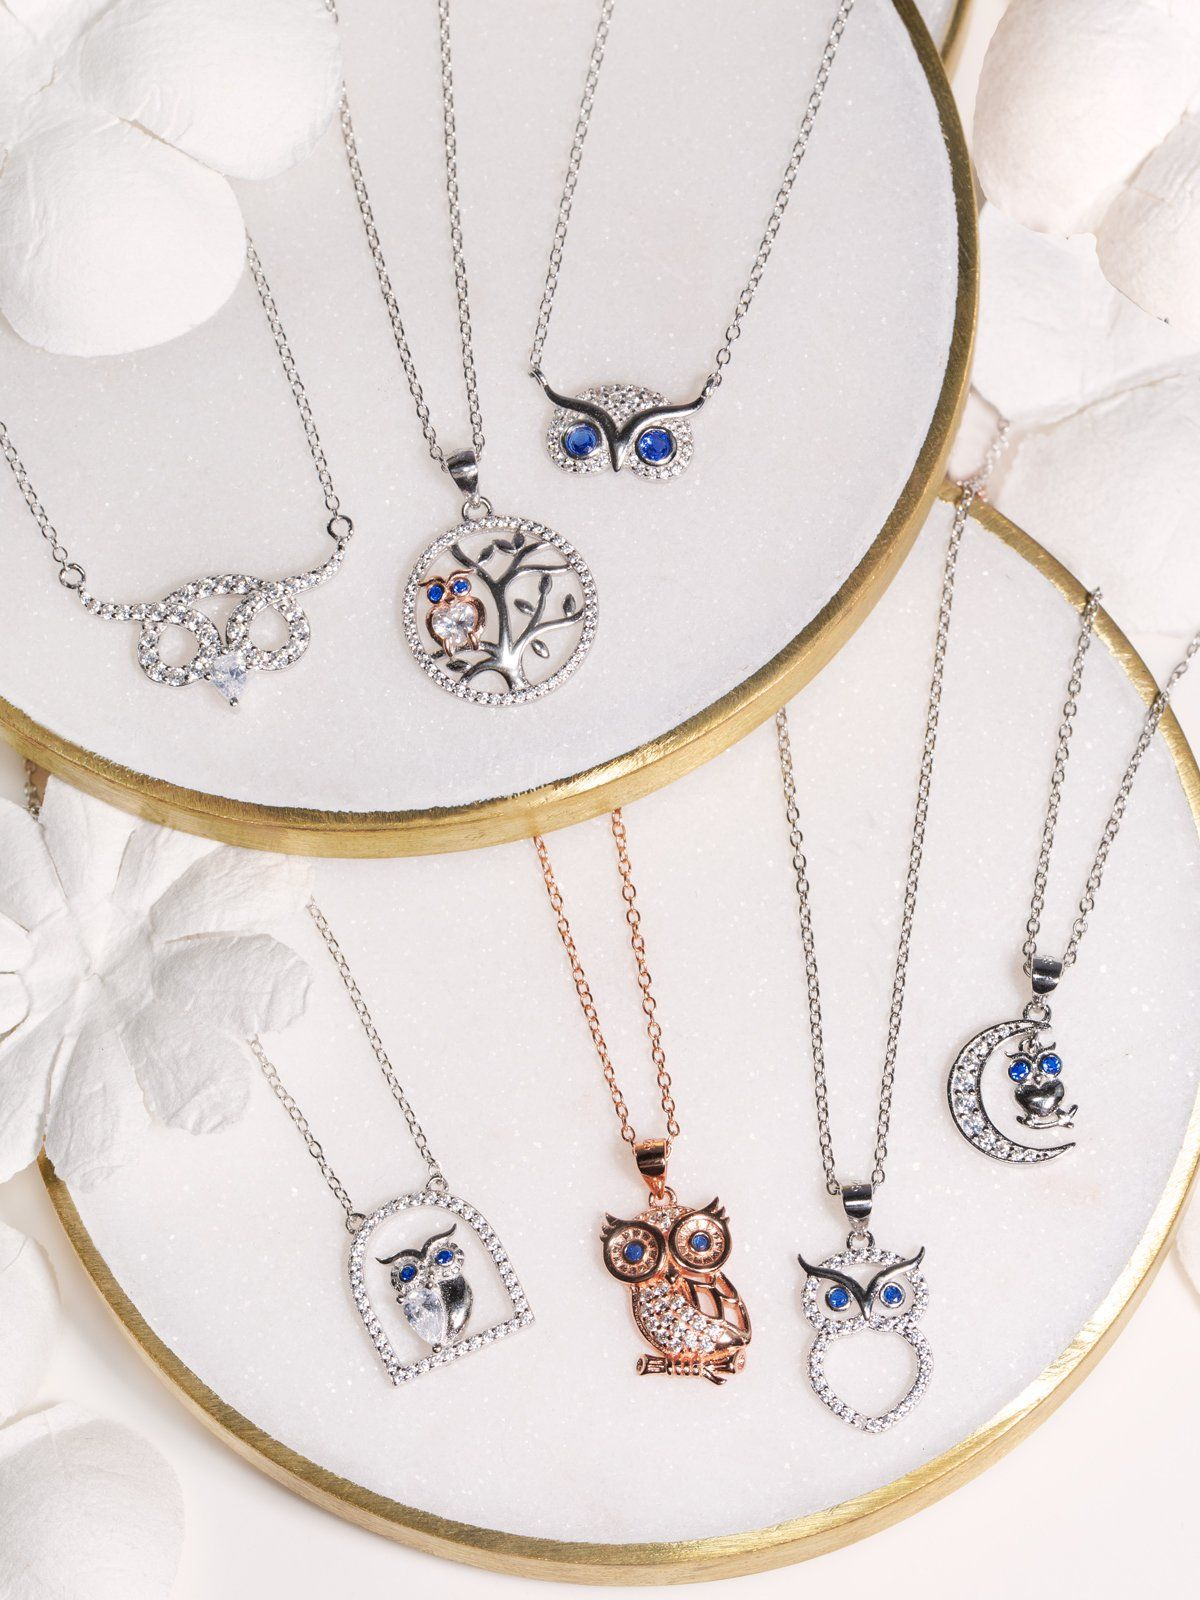 Novelty Necklace KnSam Women Alloy Pendant Necklaces Crystal Heart Blue